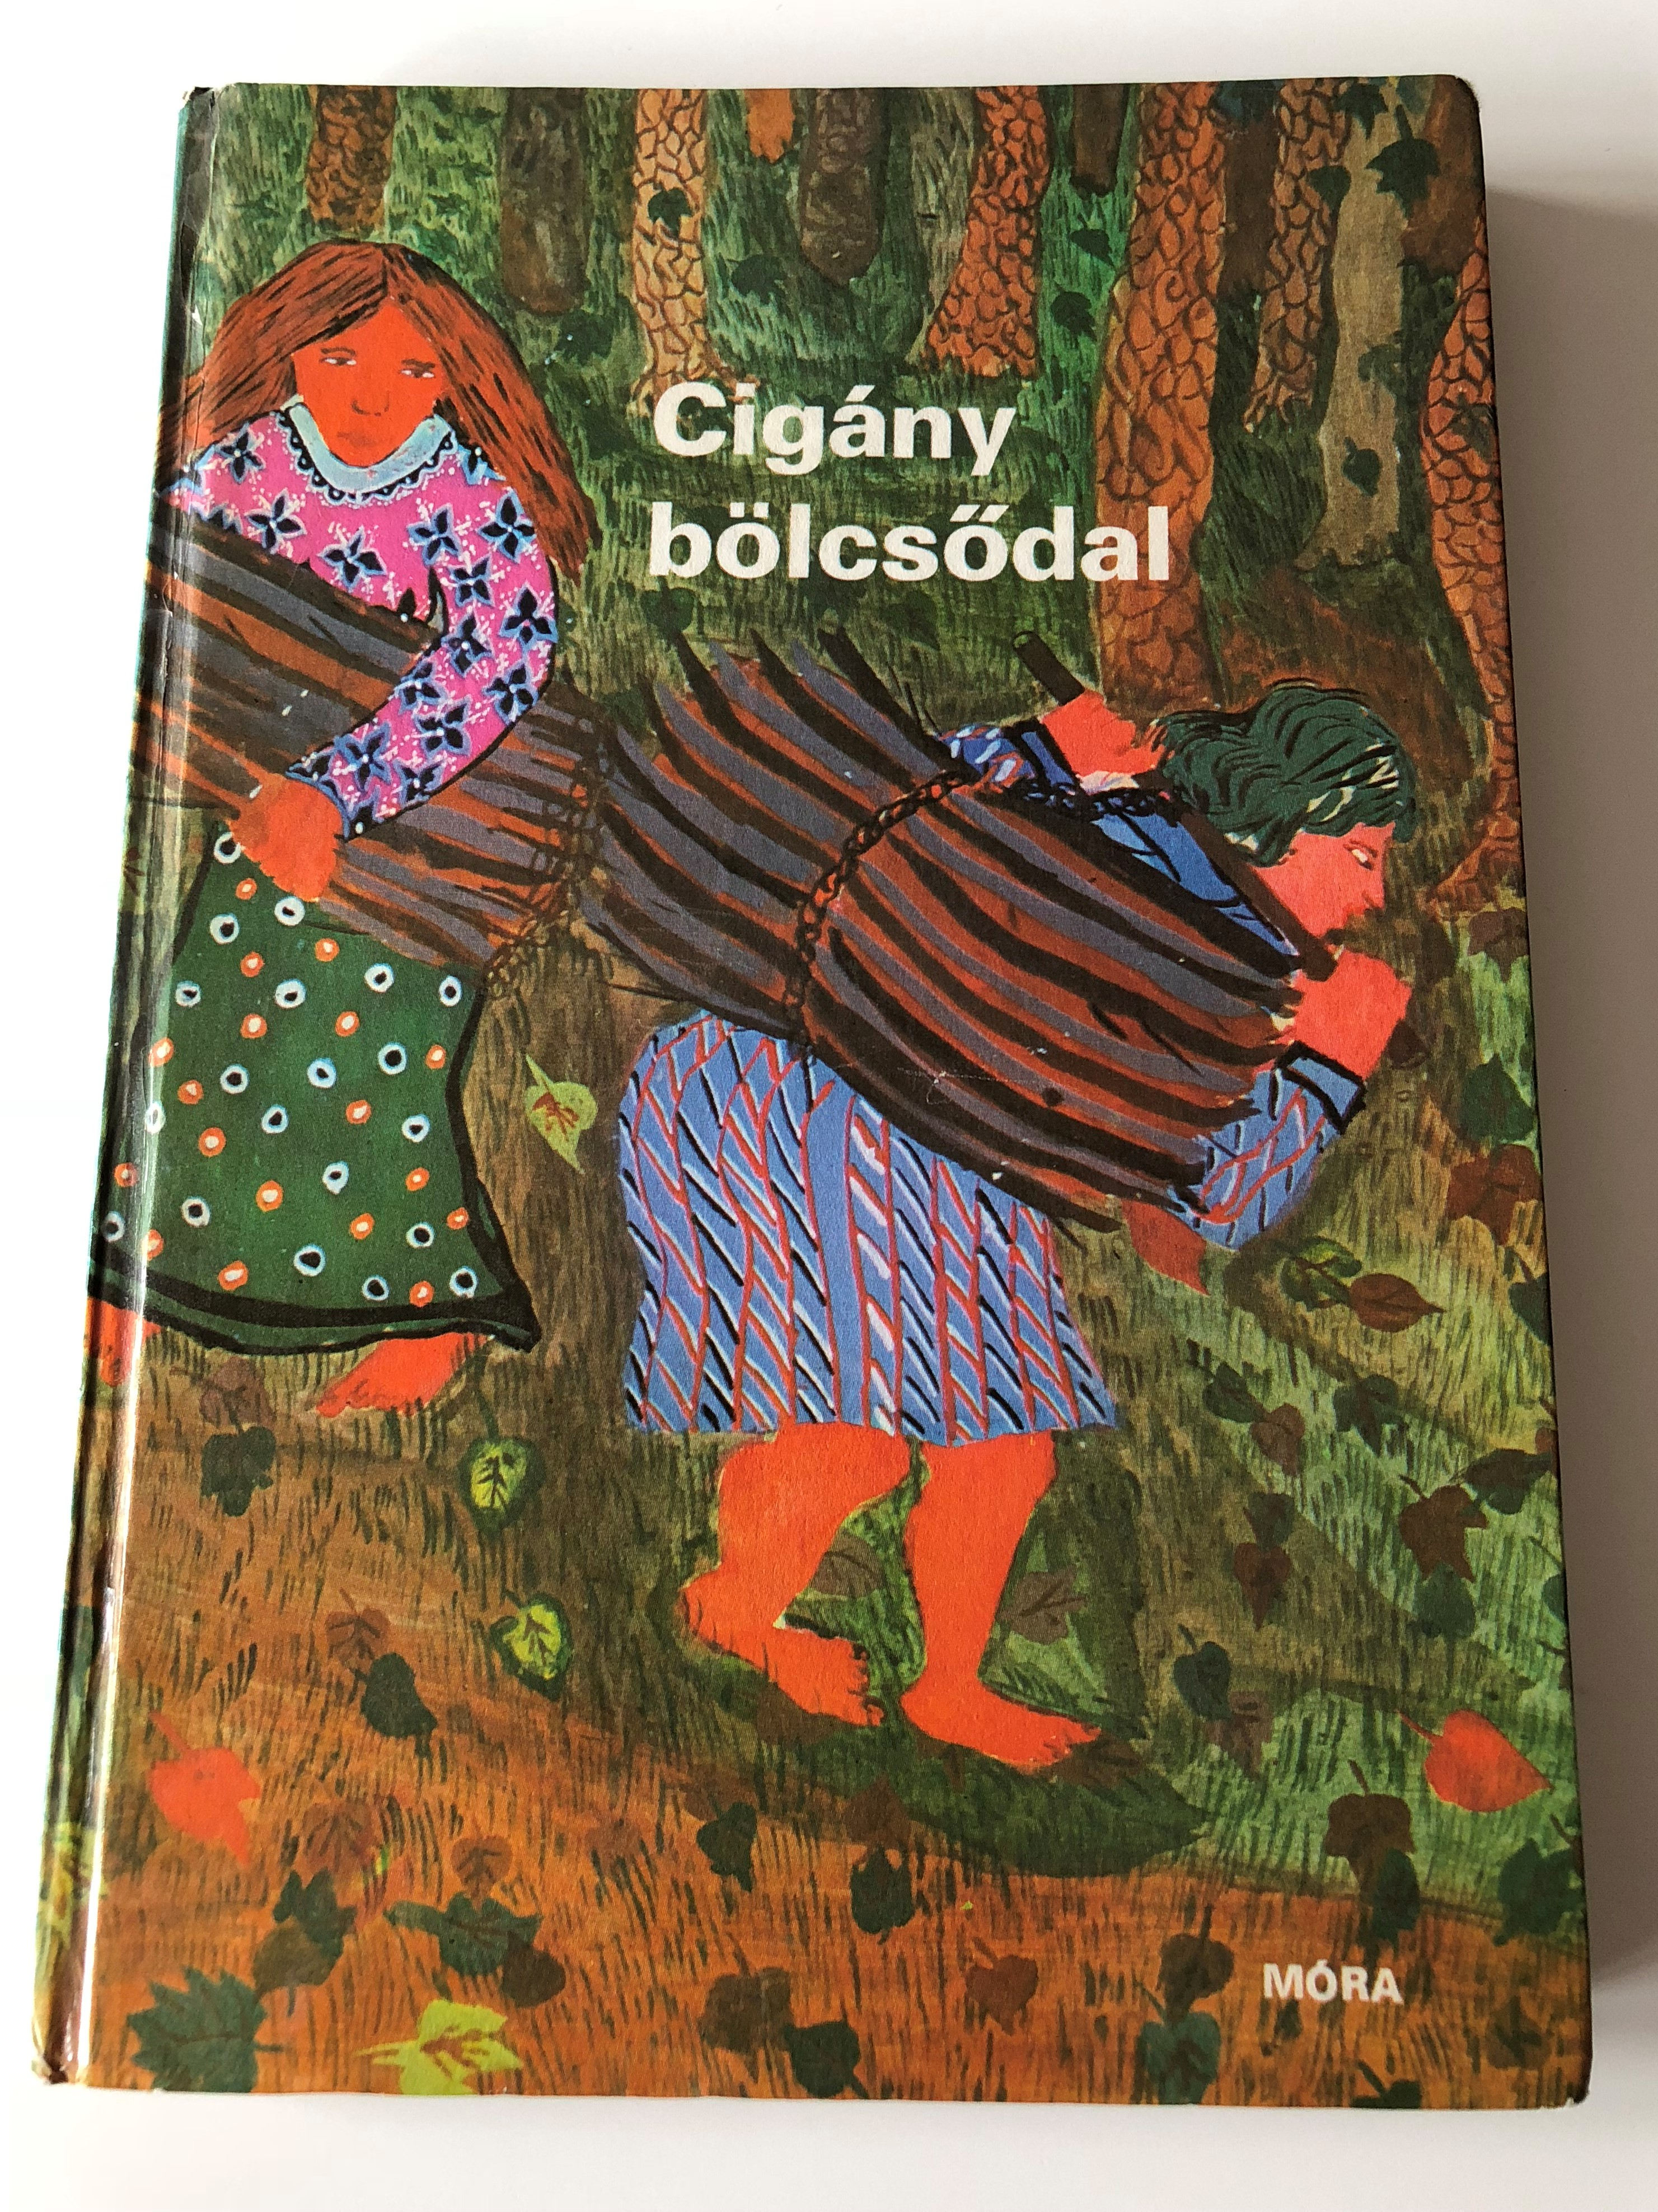 cigany-bolcsodal-mora-1980-gypsy-cradle-song-szego-laszlo-.jpg